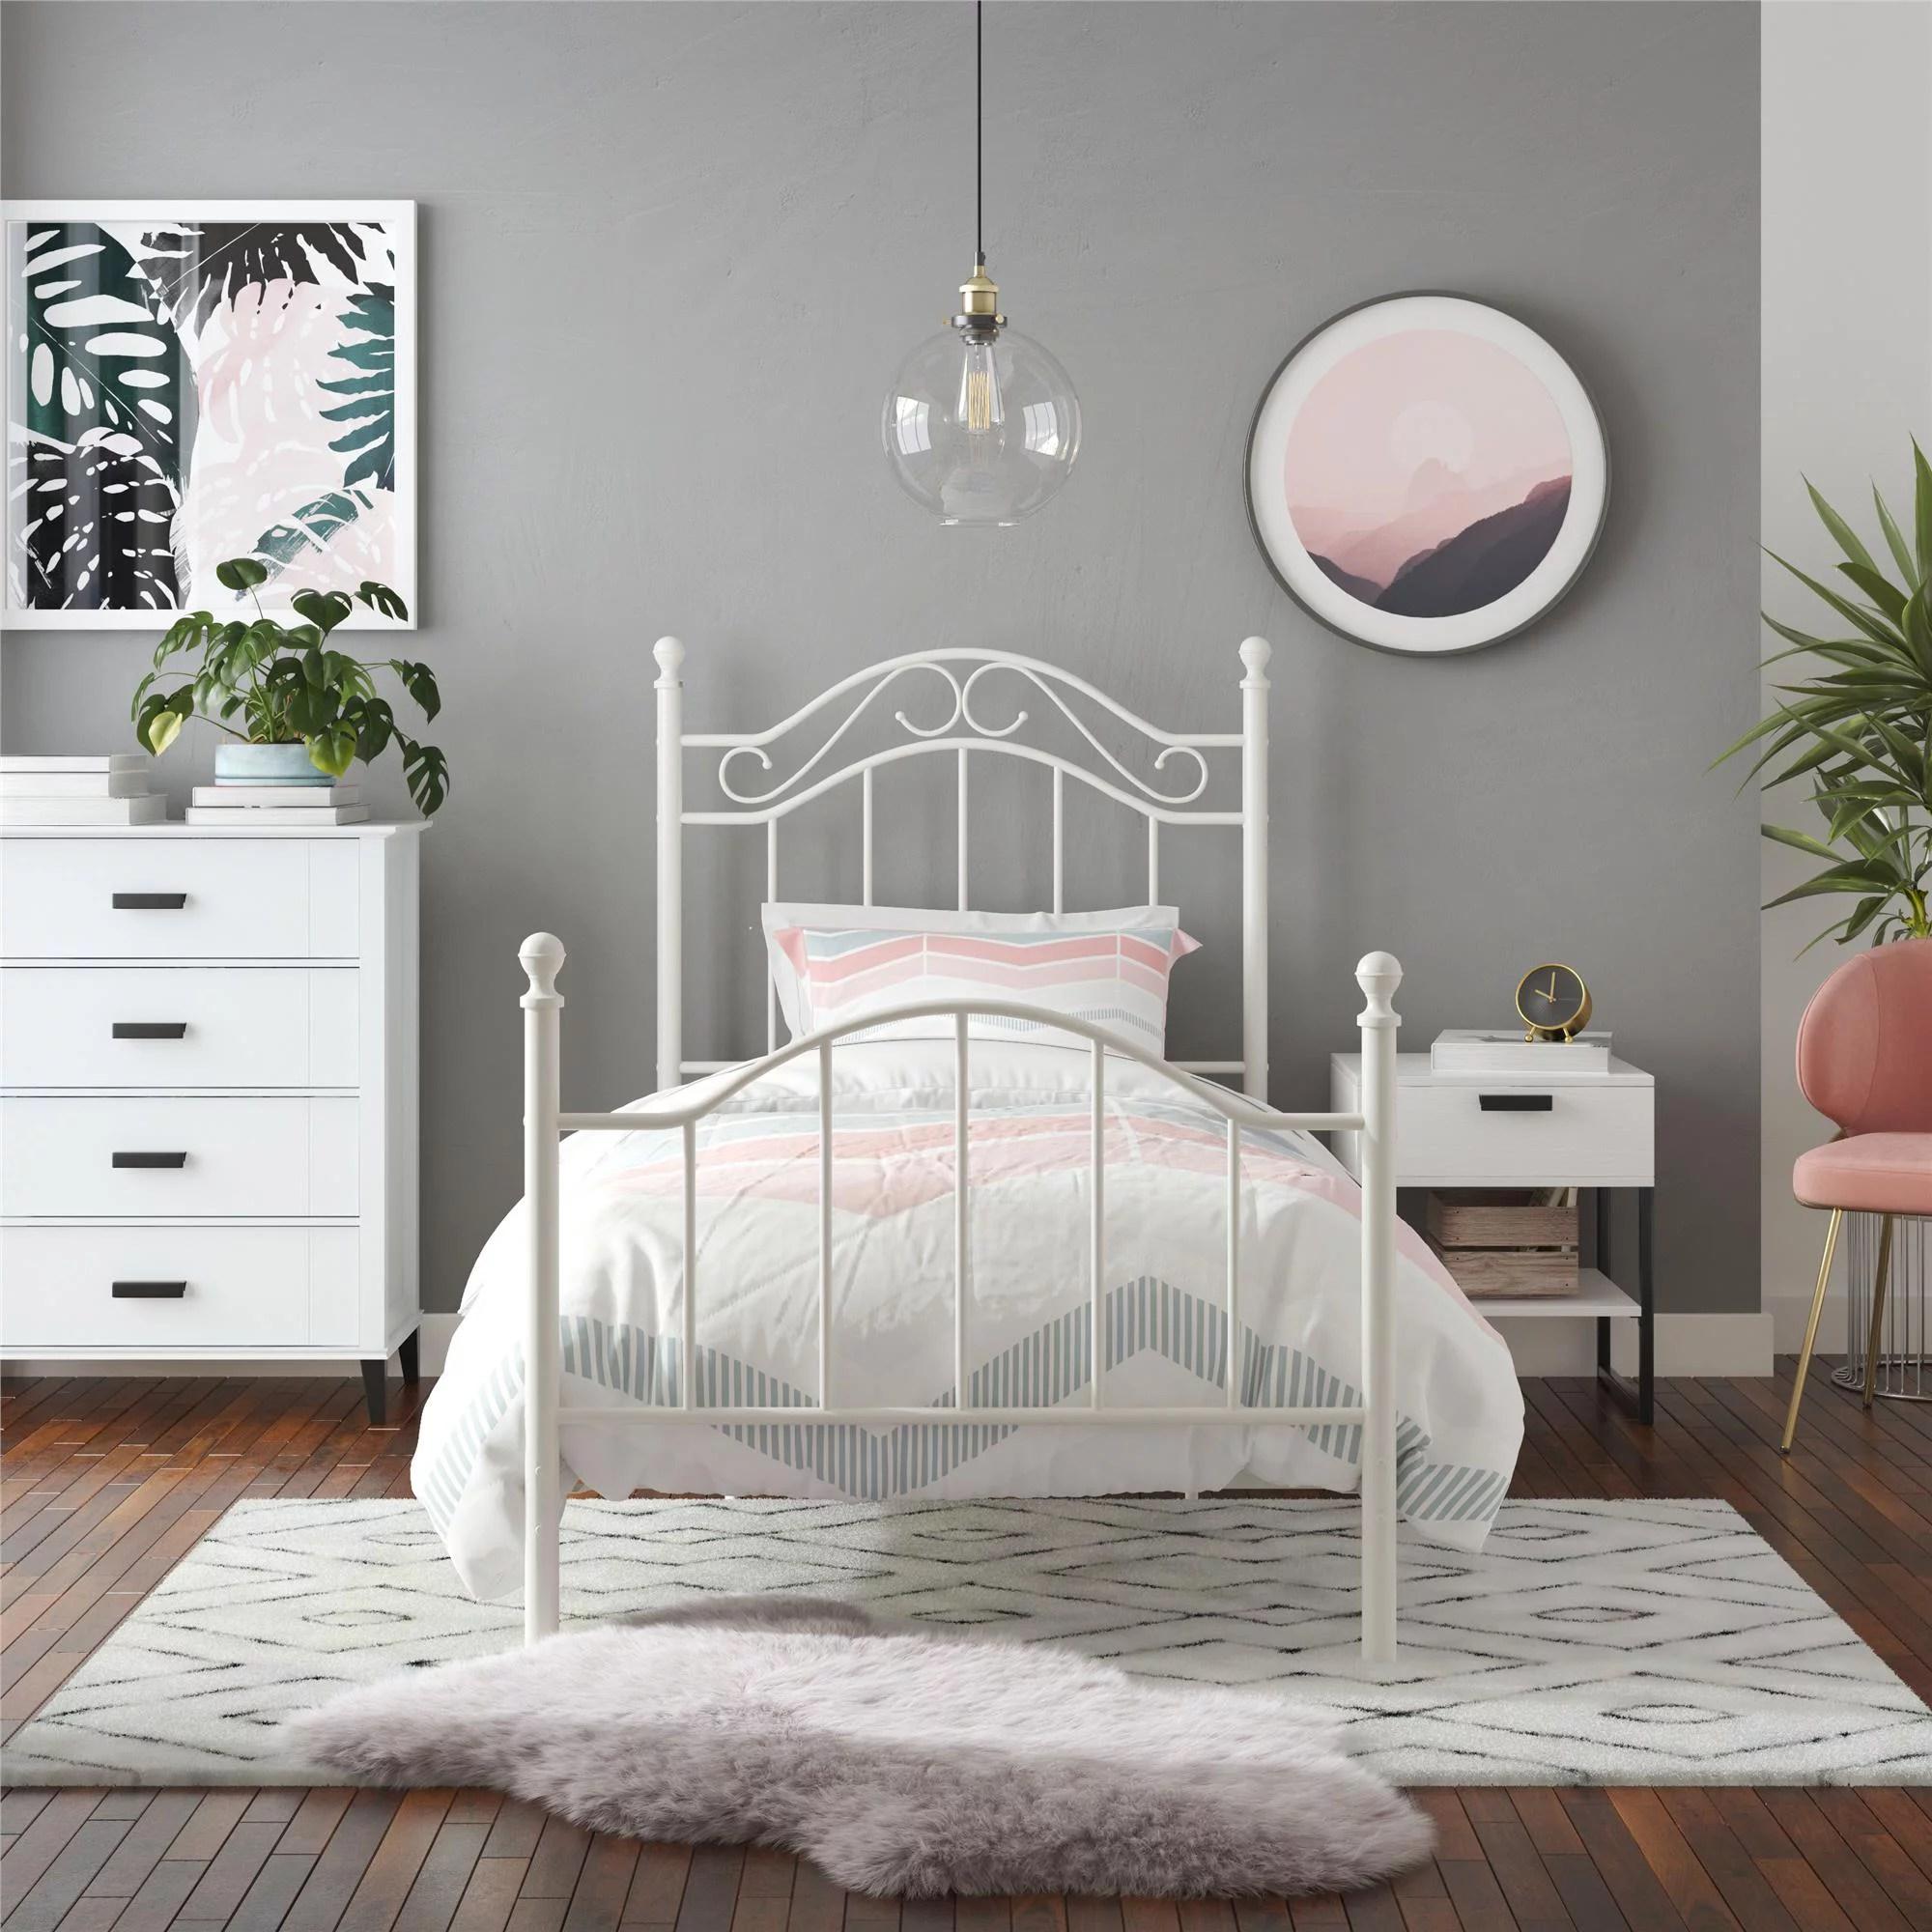 Mainstays Metal Bed Bedroom Furniture Twin Size Frame White Walmart Com Walmart Com